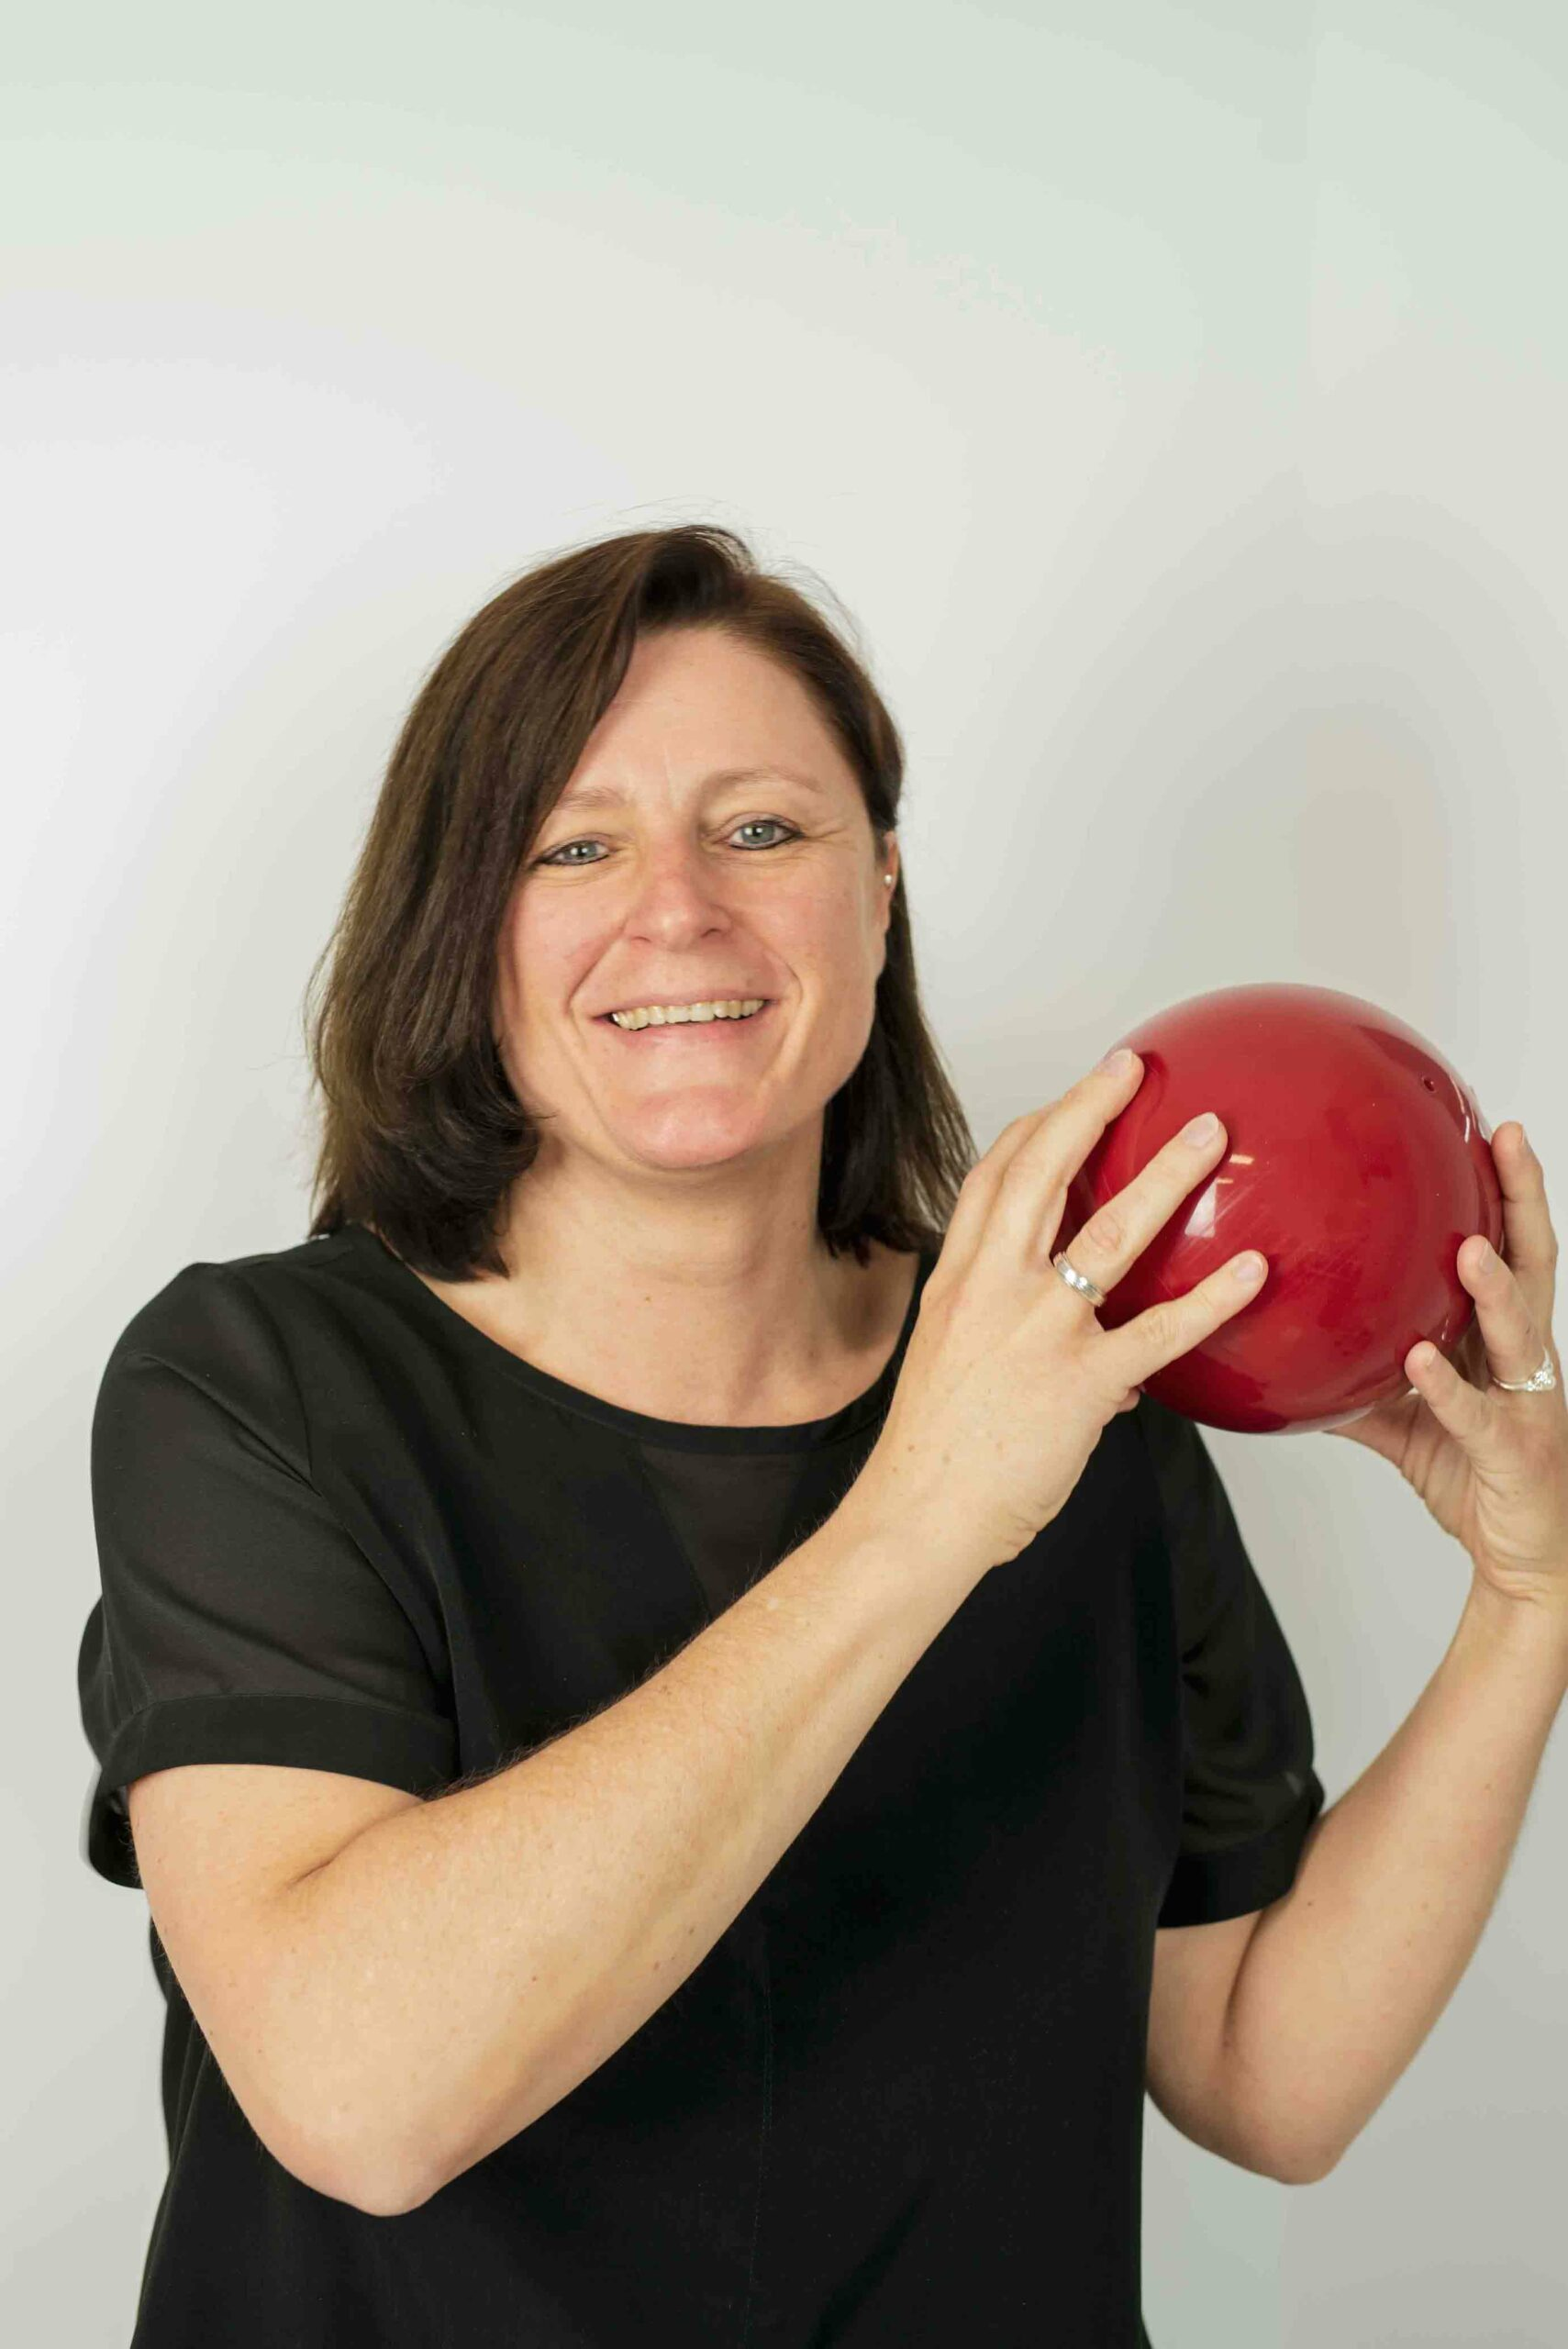 Marylin Klauke - Rehasport - Physiotherapie Physio Plus GbR Inden